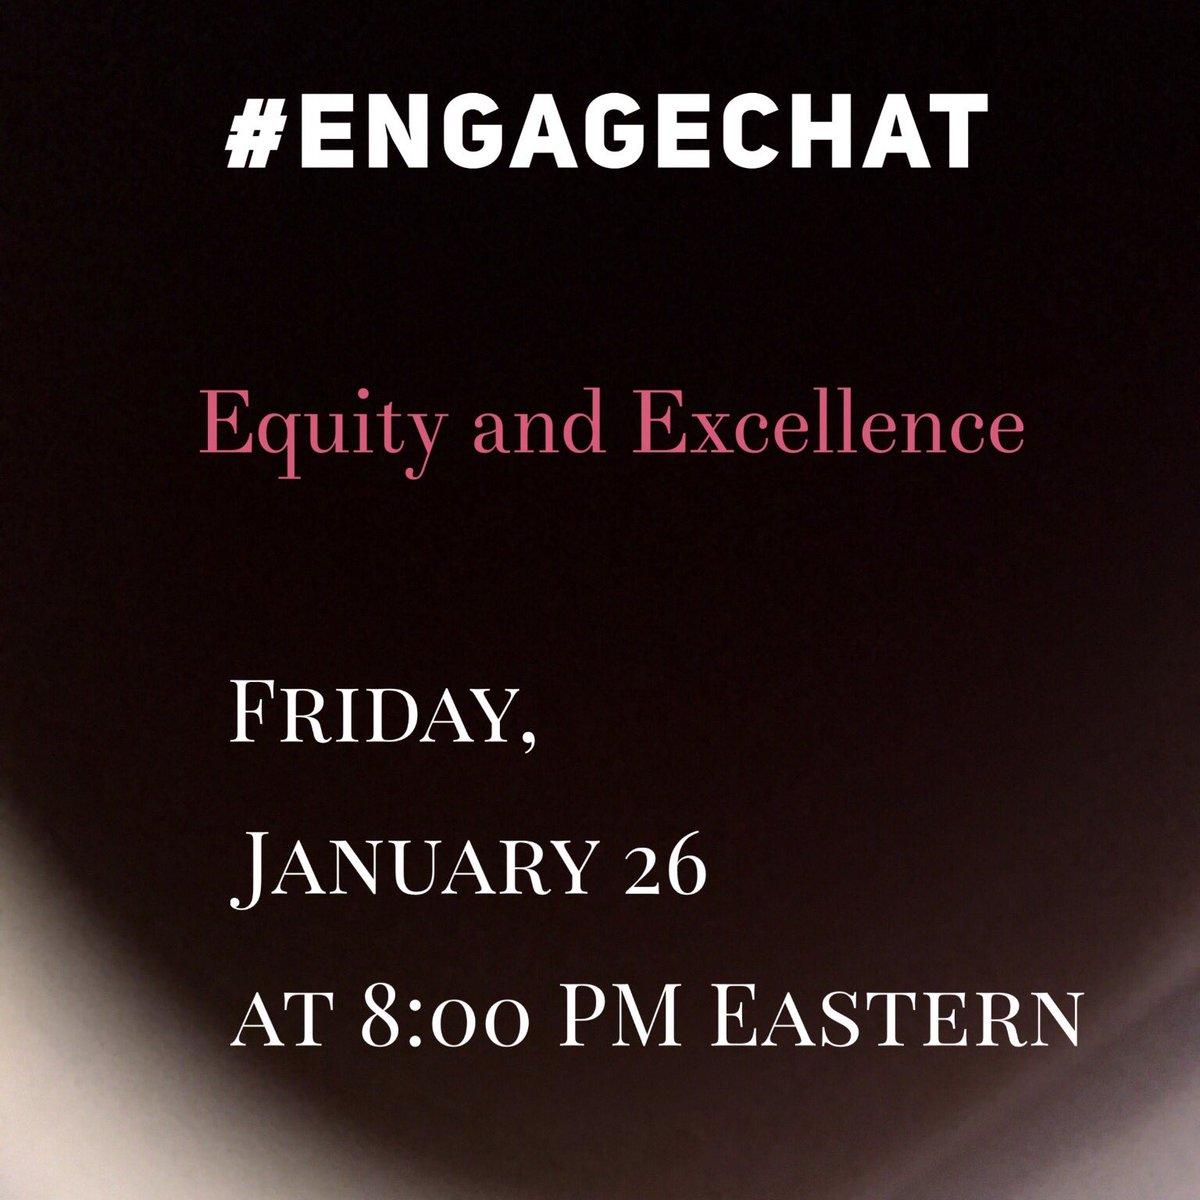 #engagechat